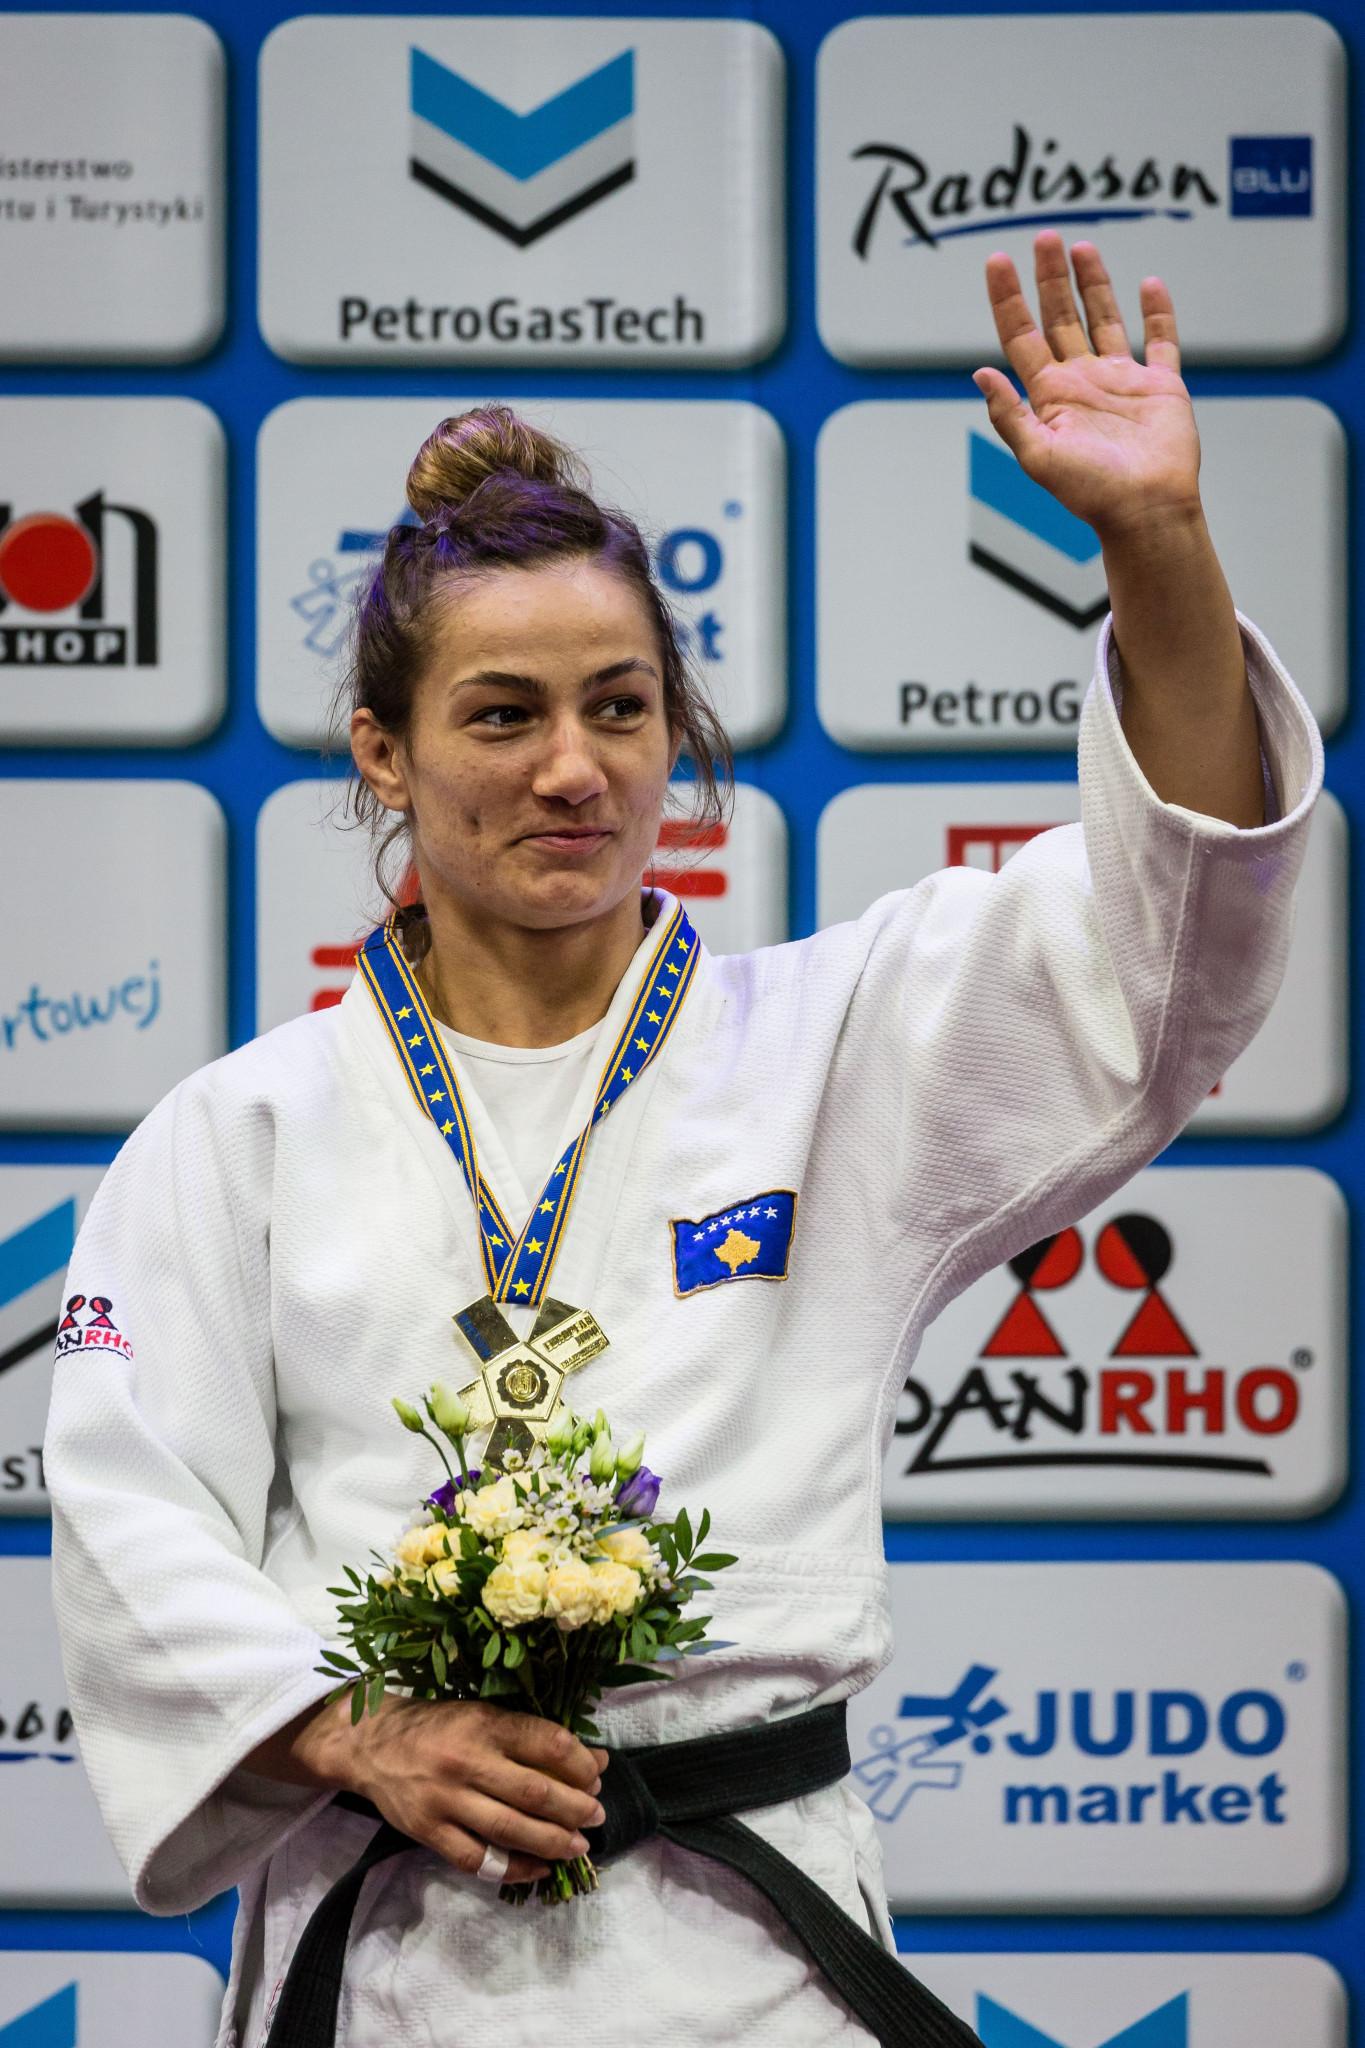 Judo gold medallist attends Olympic Festival in Kosovo